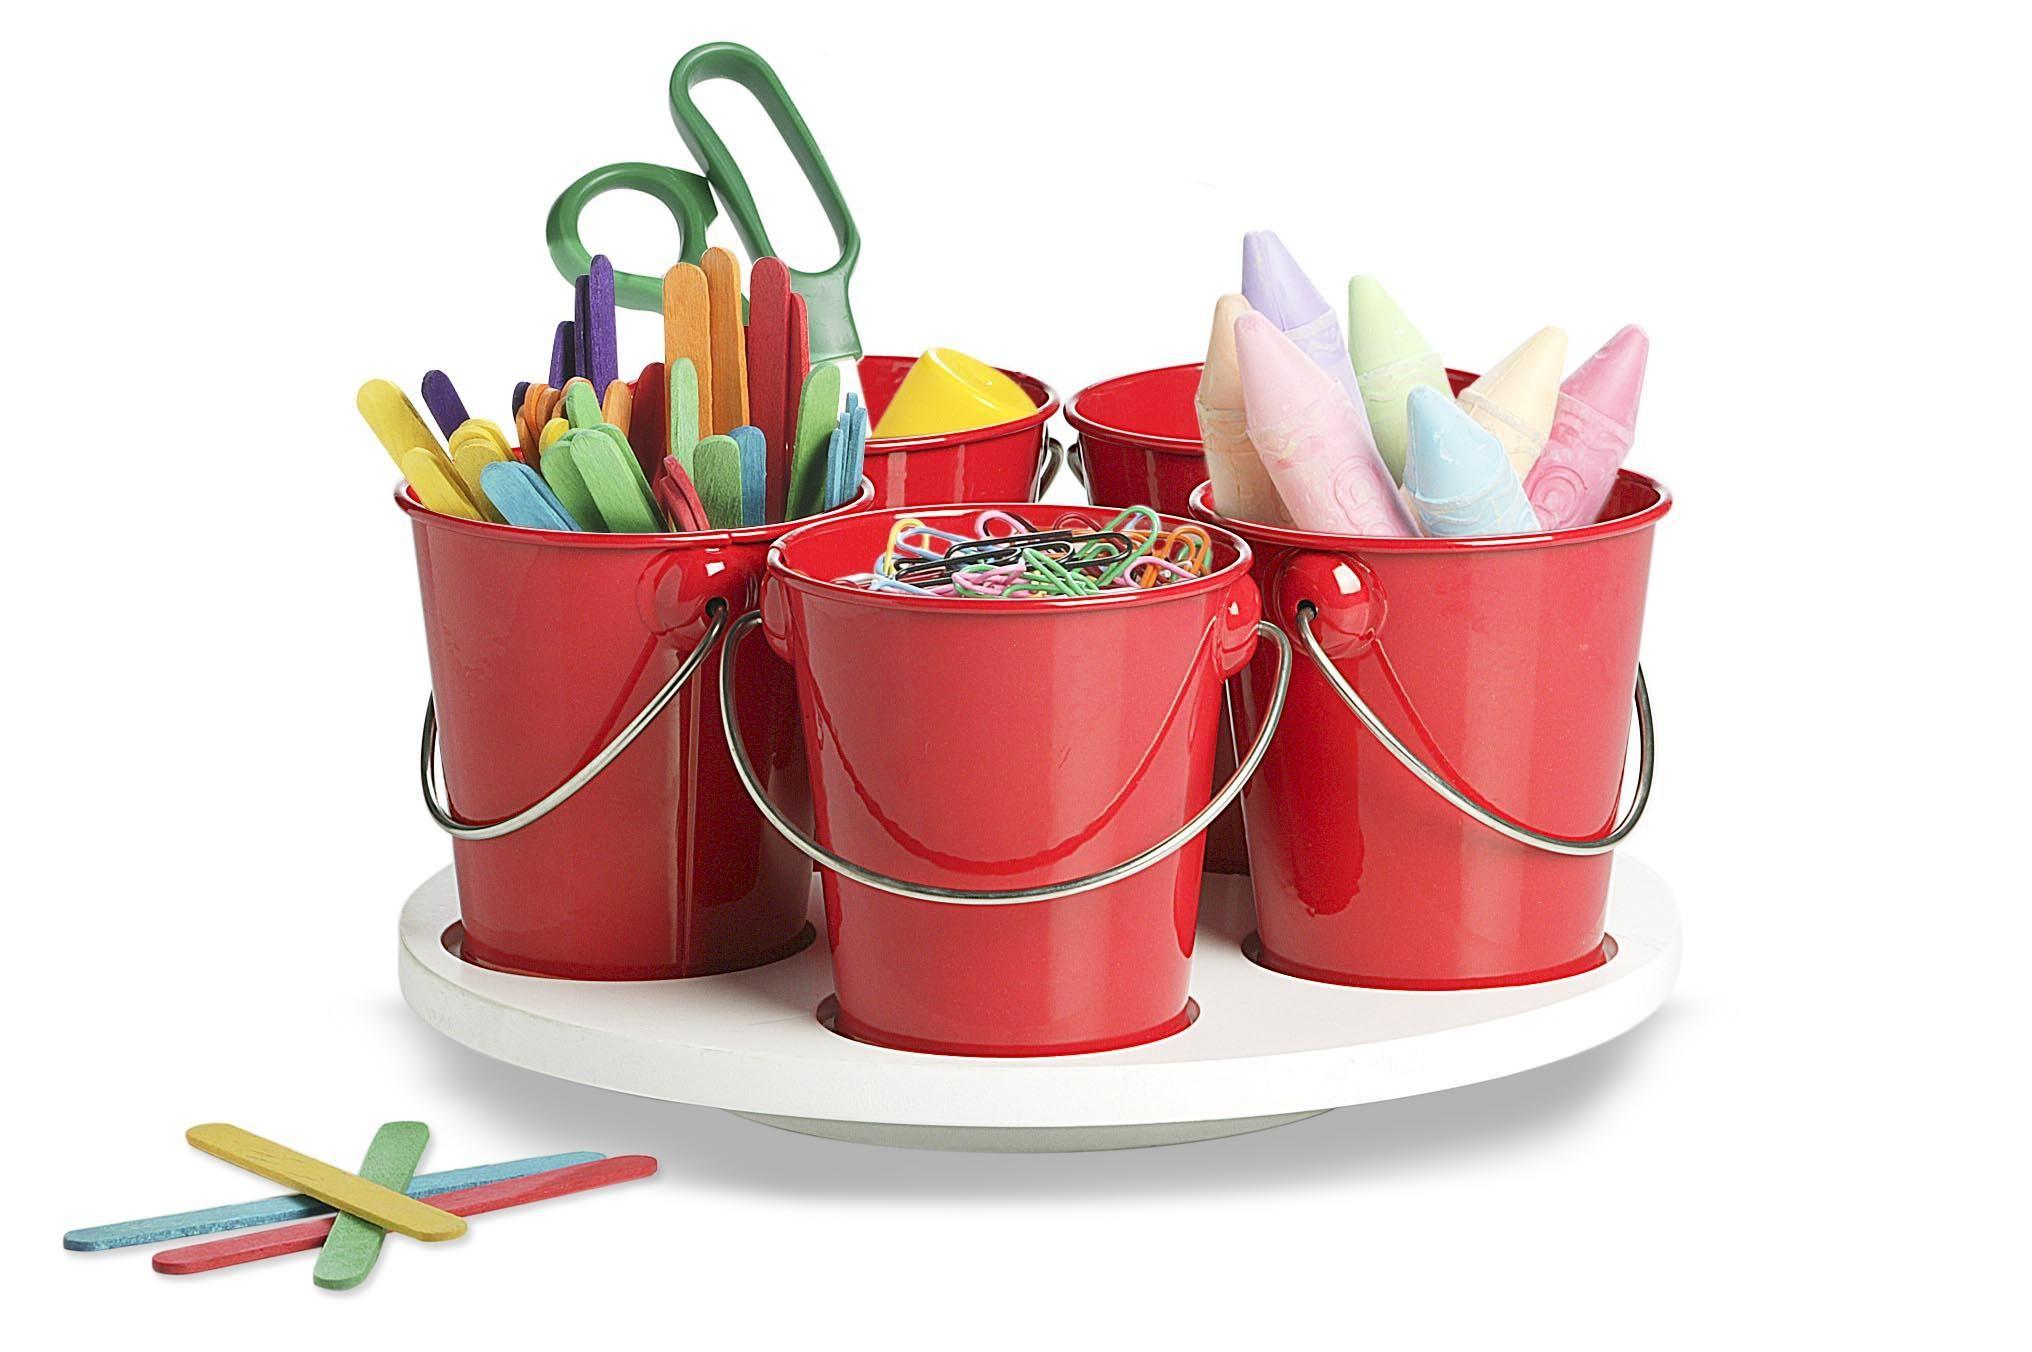 Mini Bucket Craft Turntable, good idea!